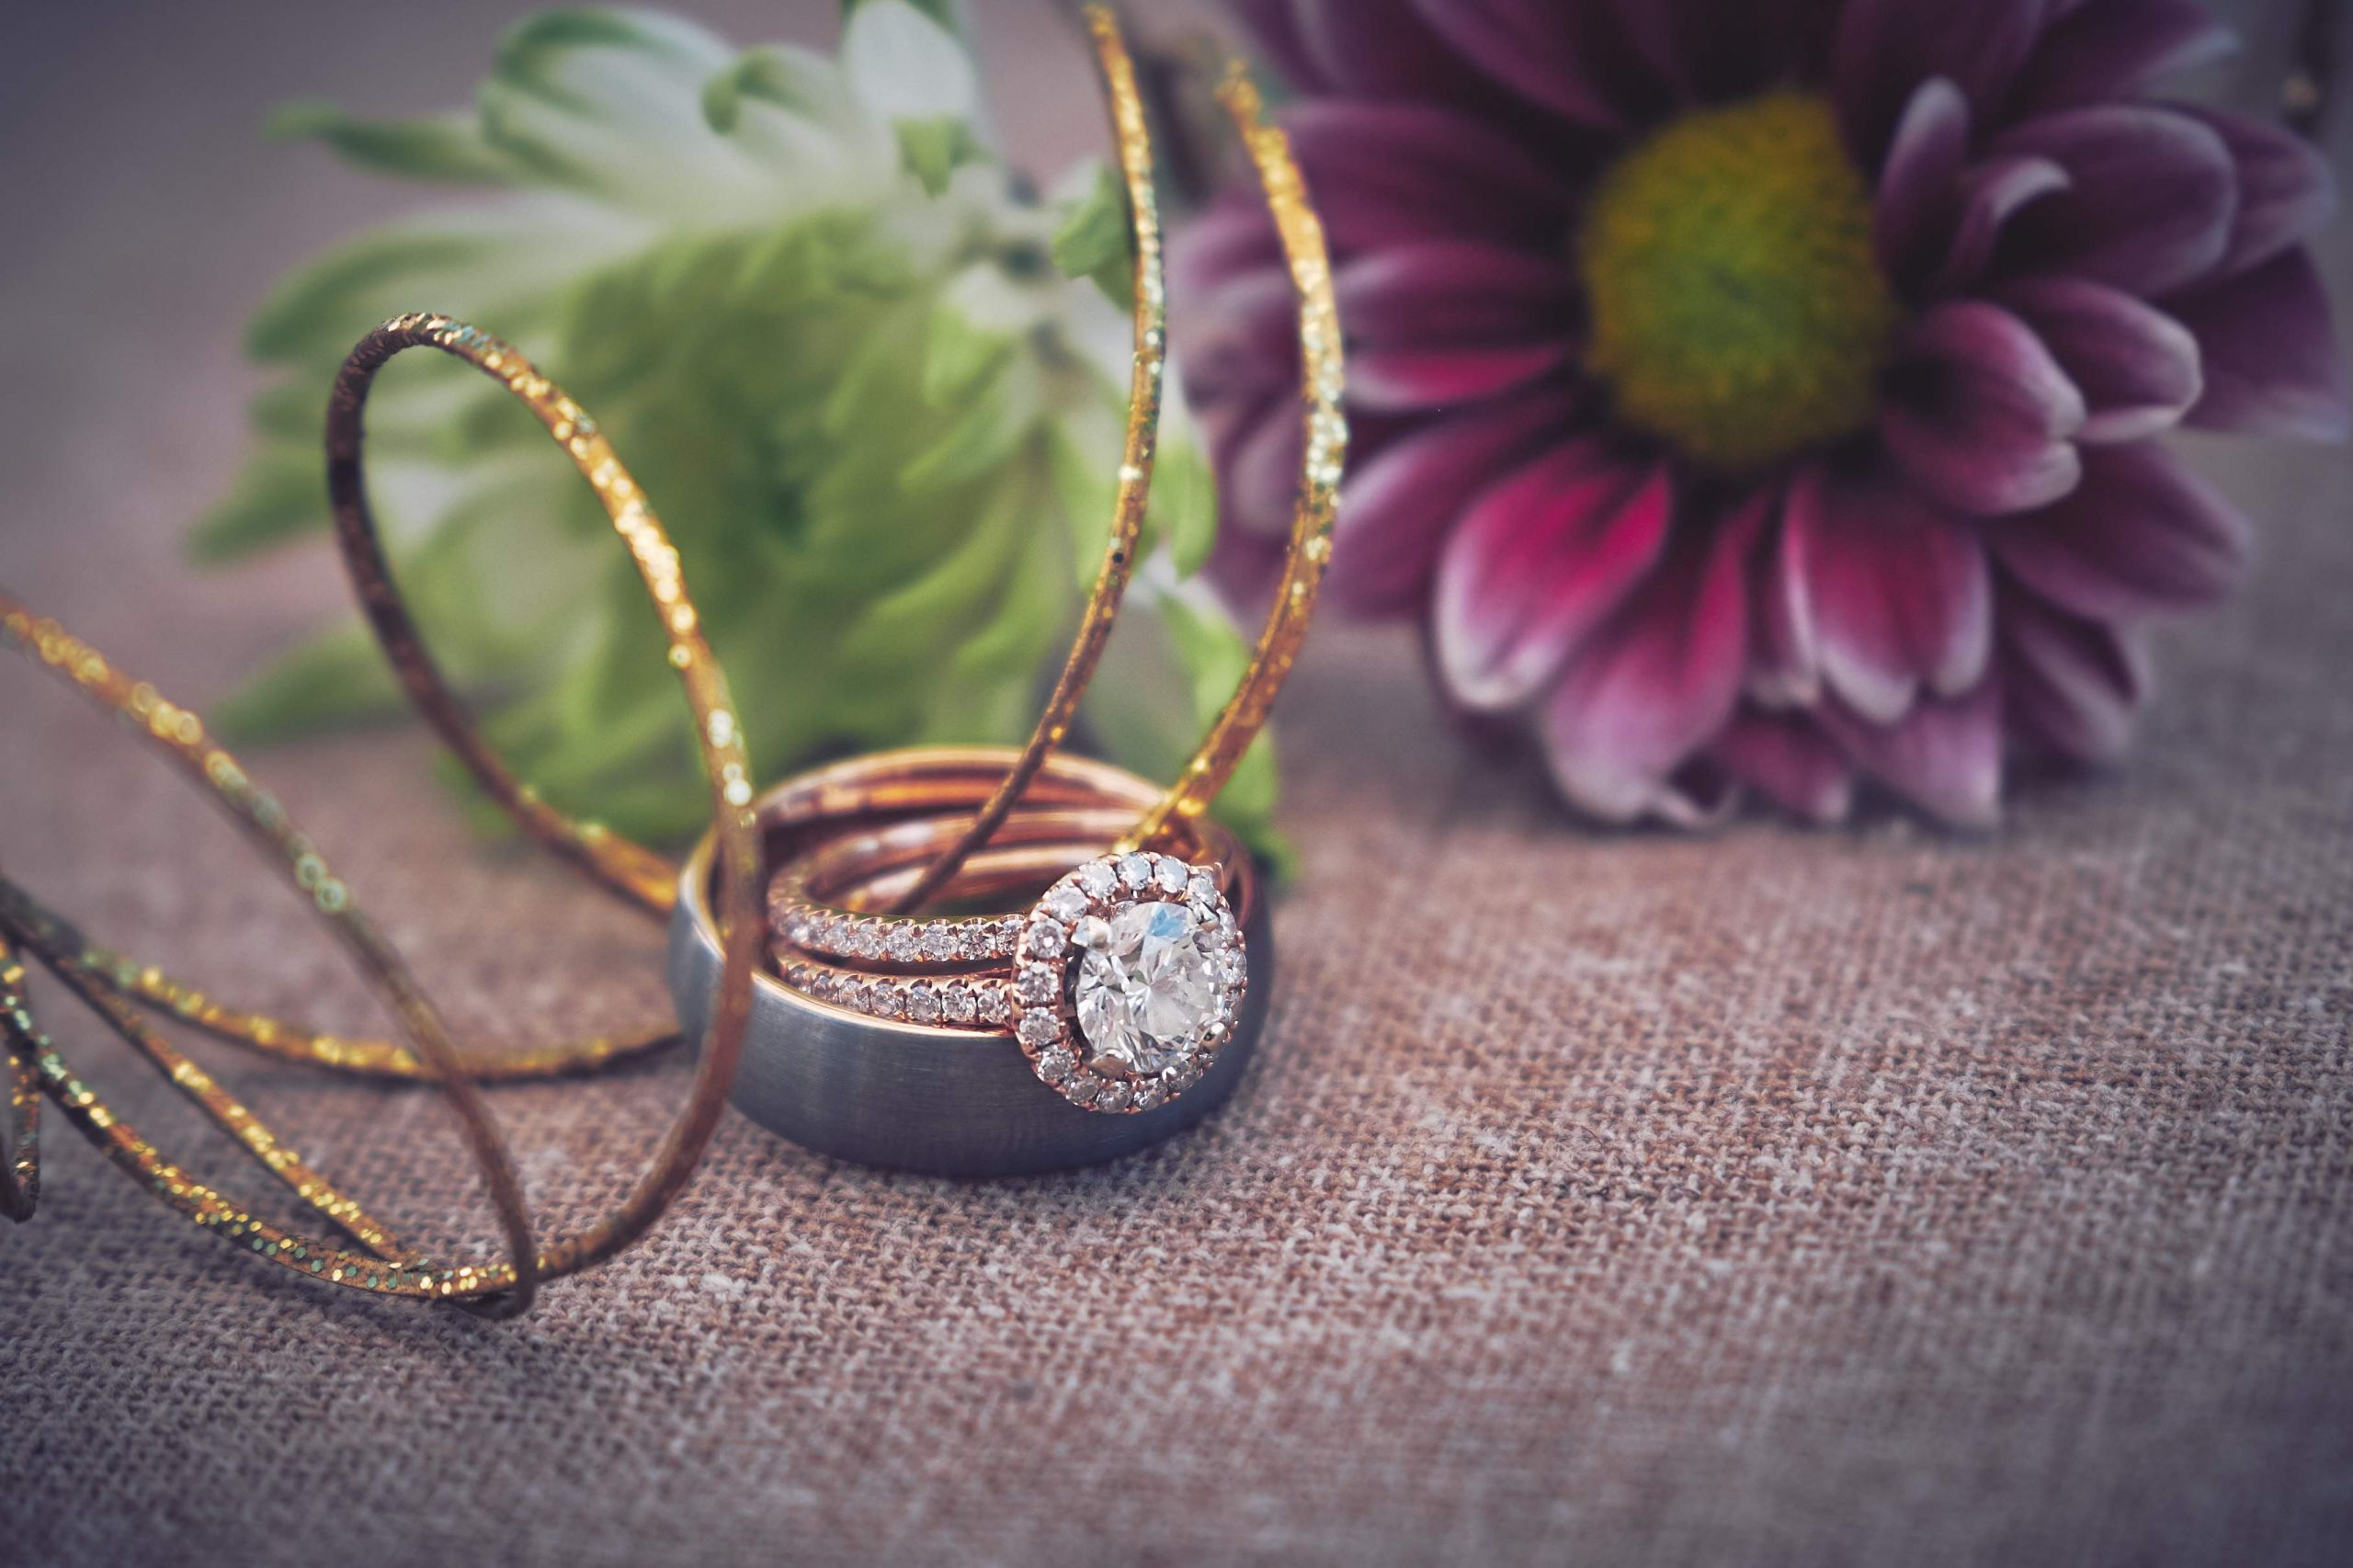 f fb8ef1edc3372a72ce9d A2U3ZjJmZWUzMjI5 wedding rings